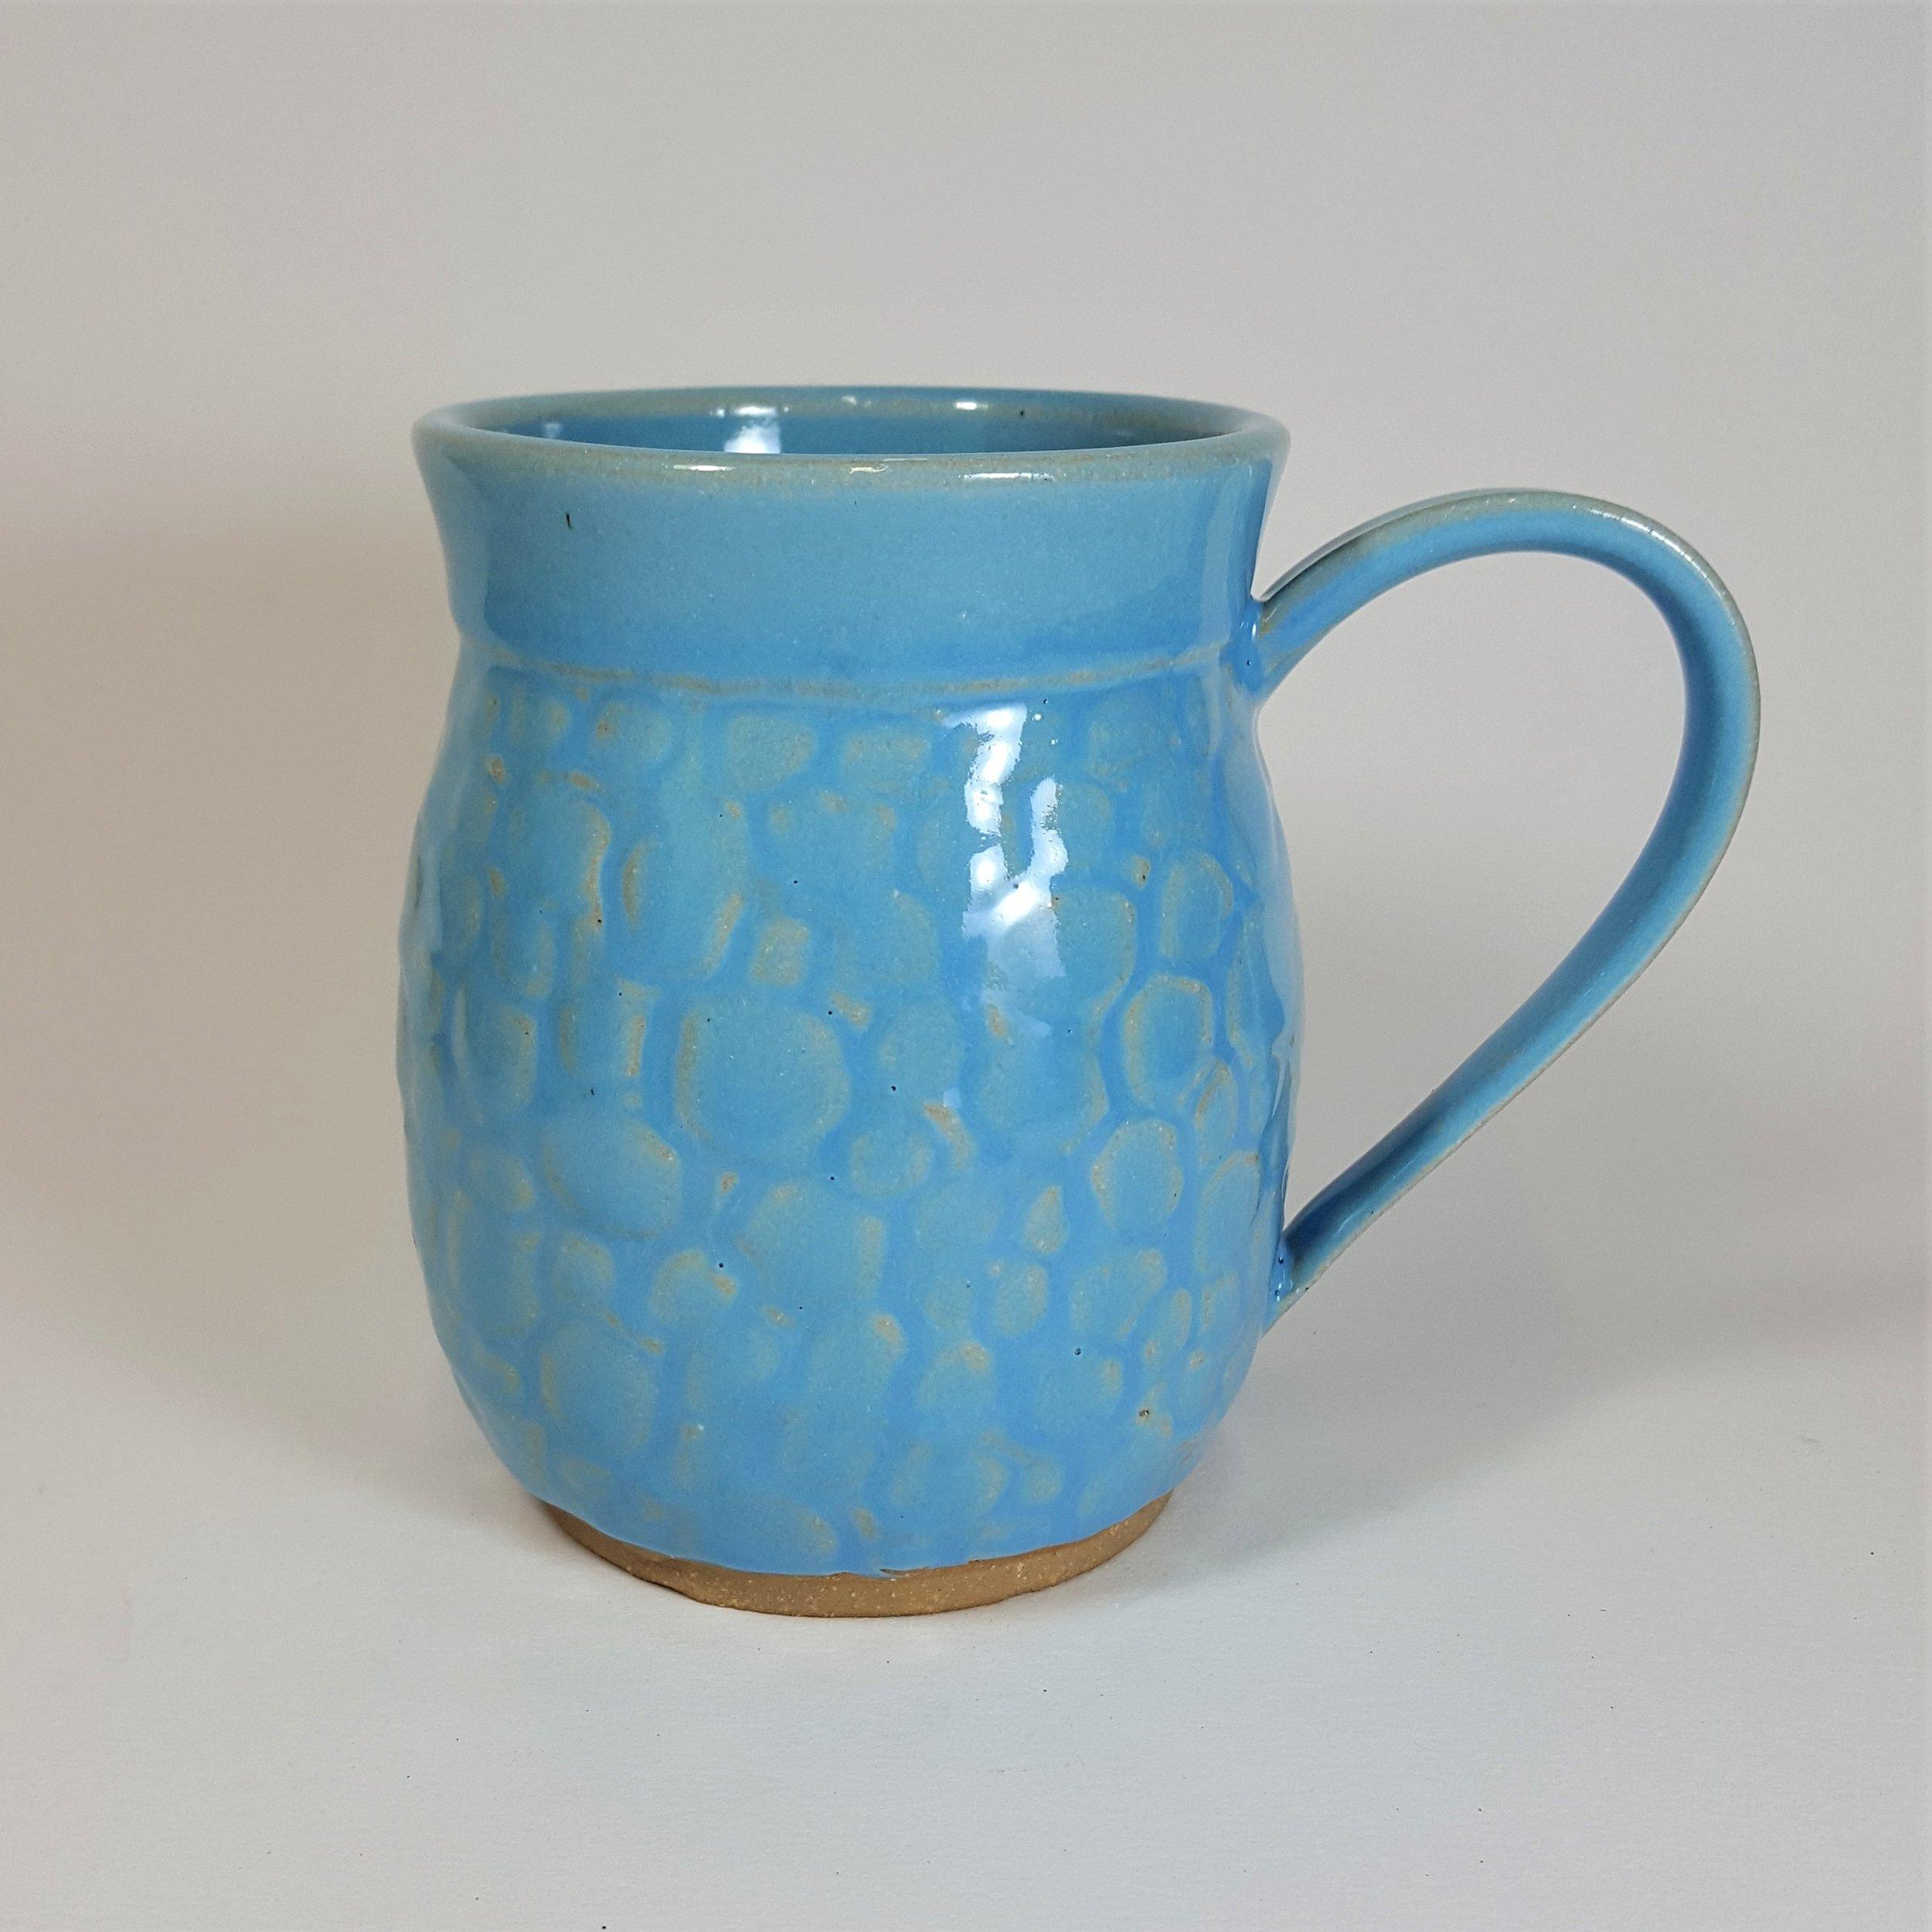 16 oz. Light Blue Dragon Scale Mug - $45